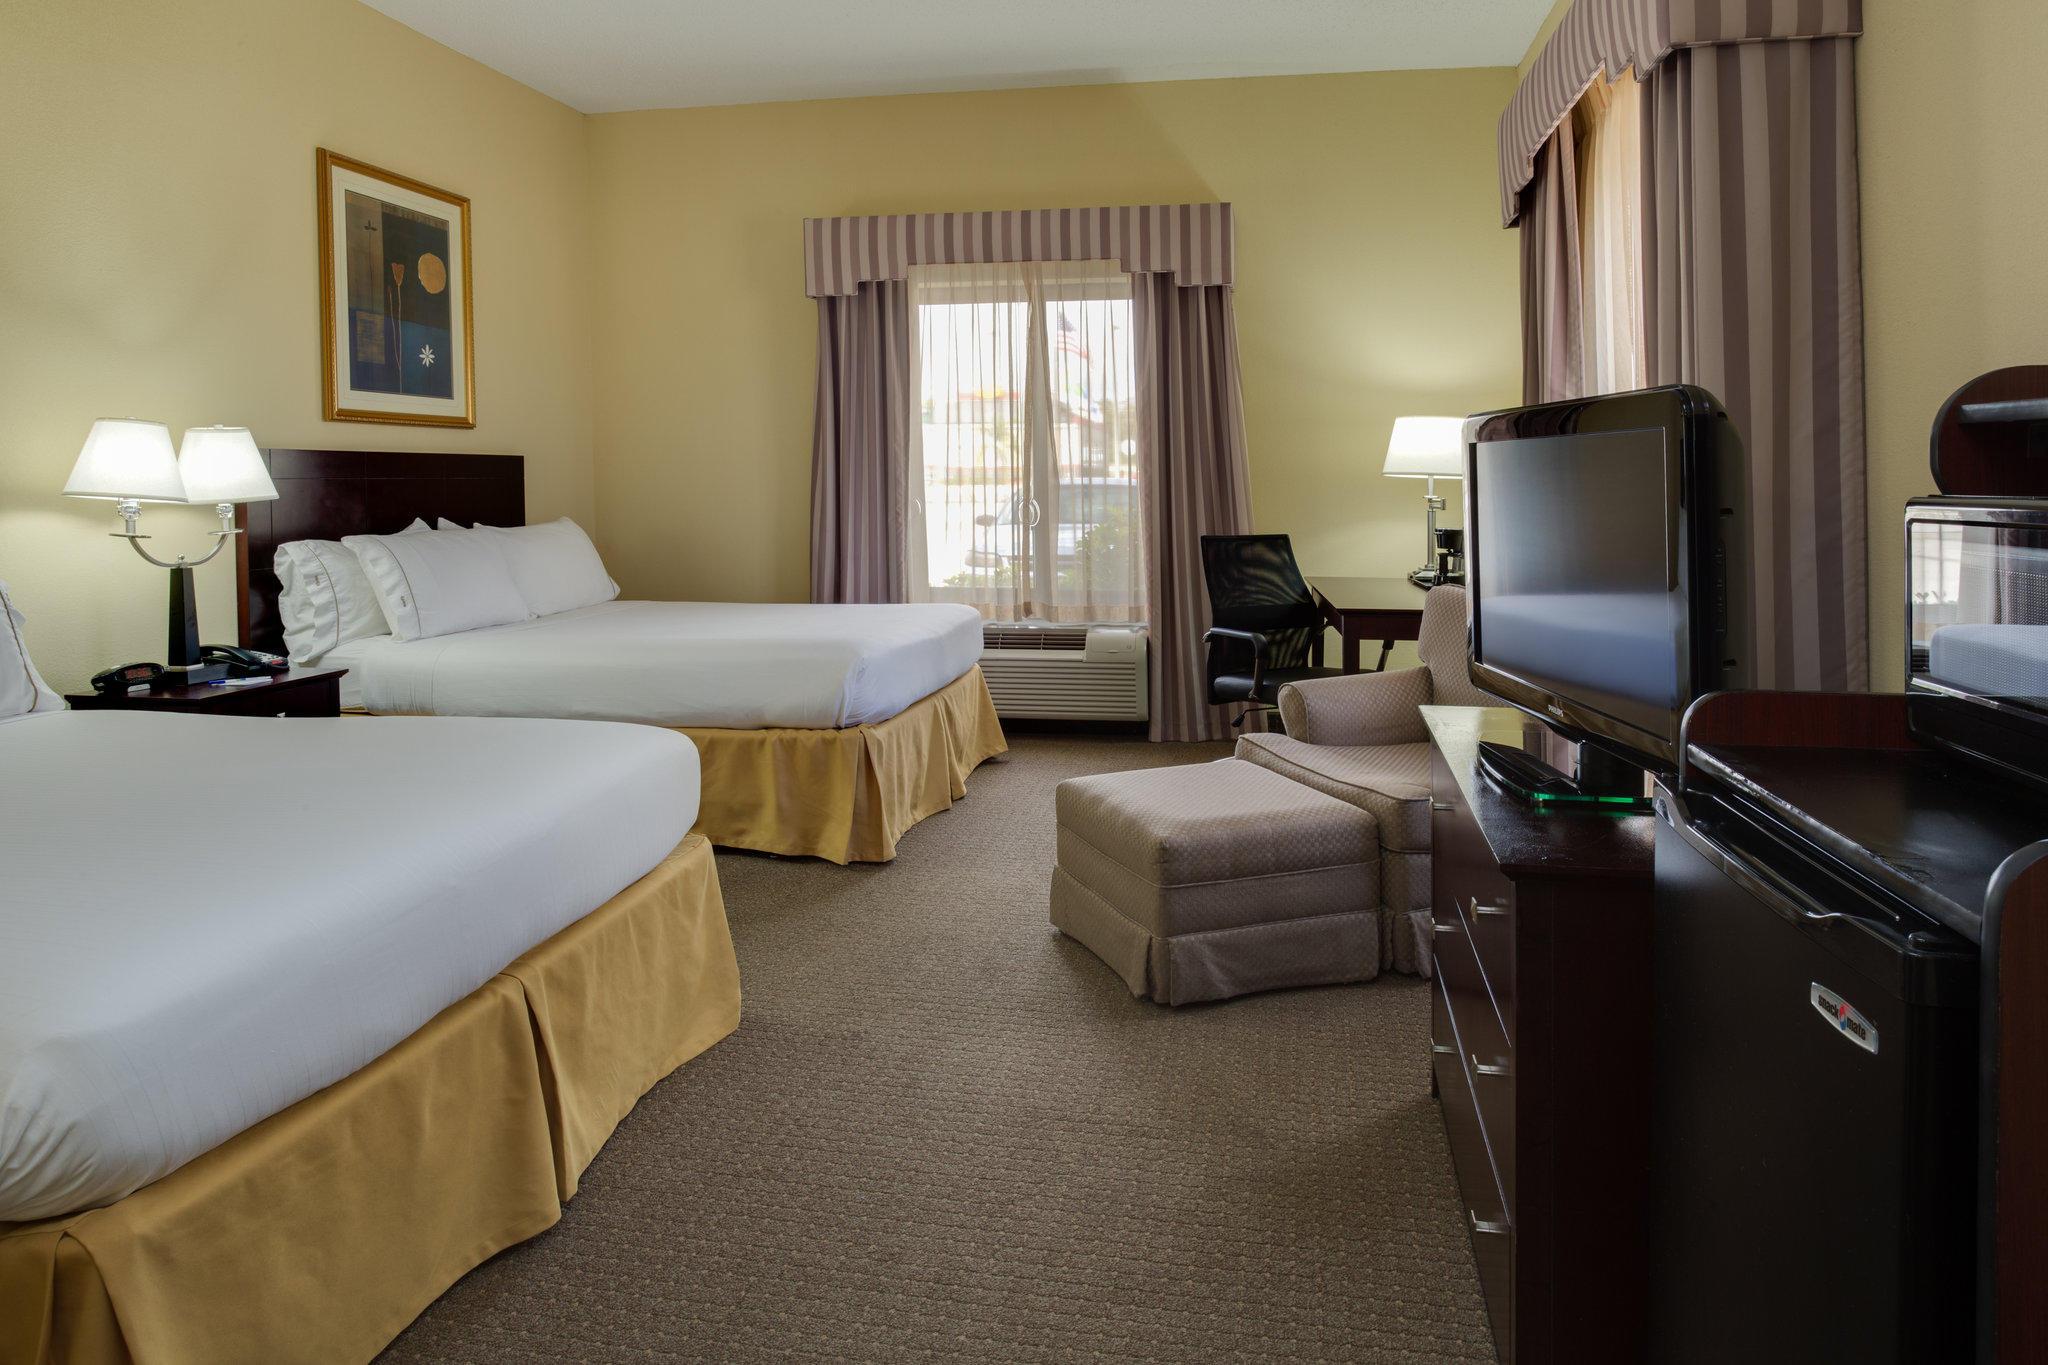 Holiday Inn Express & Suites Sebring, an IHG Hotel